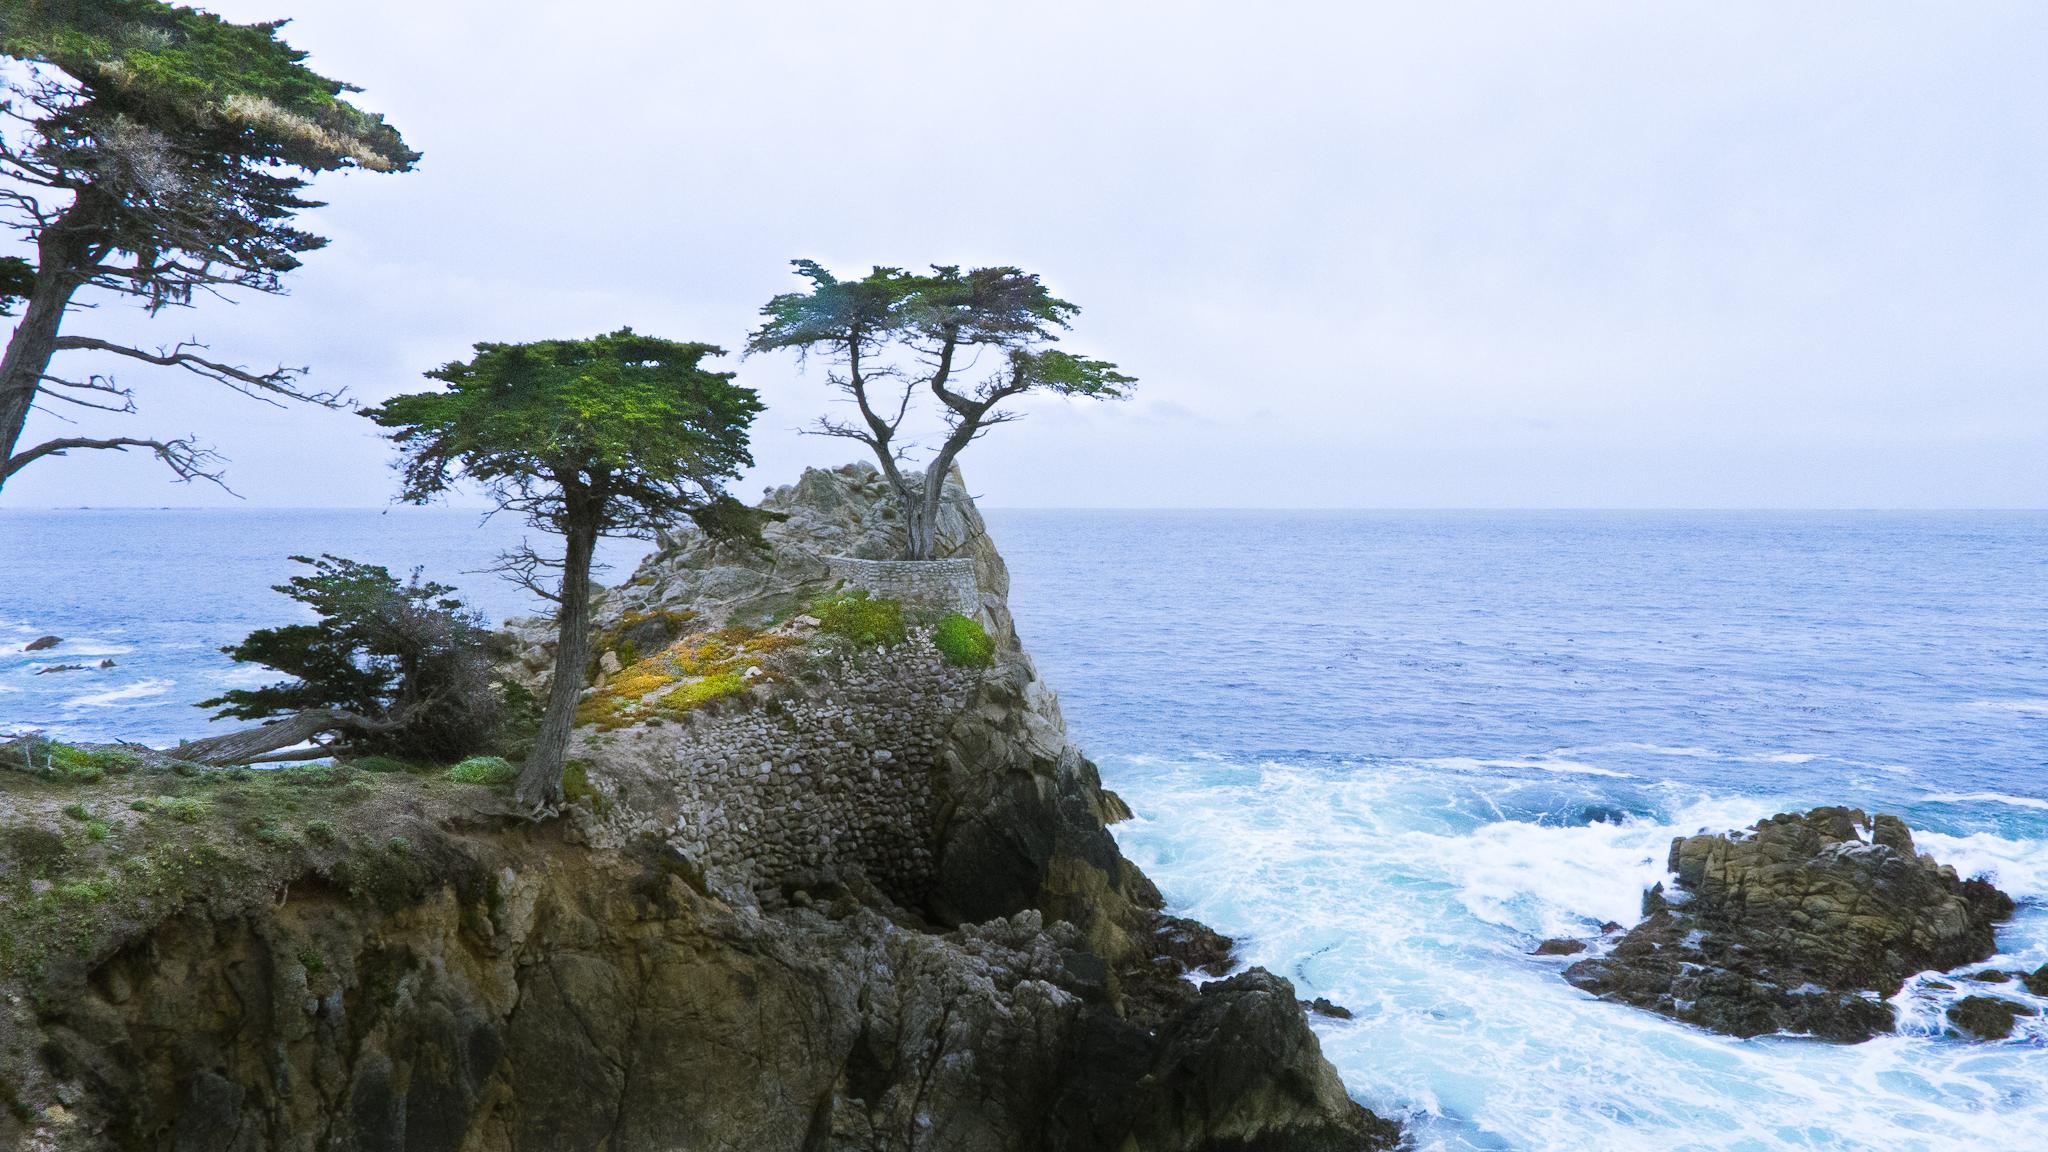 Lone Cypress, 17mile-drive